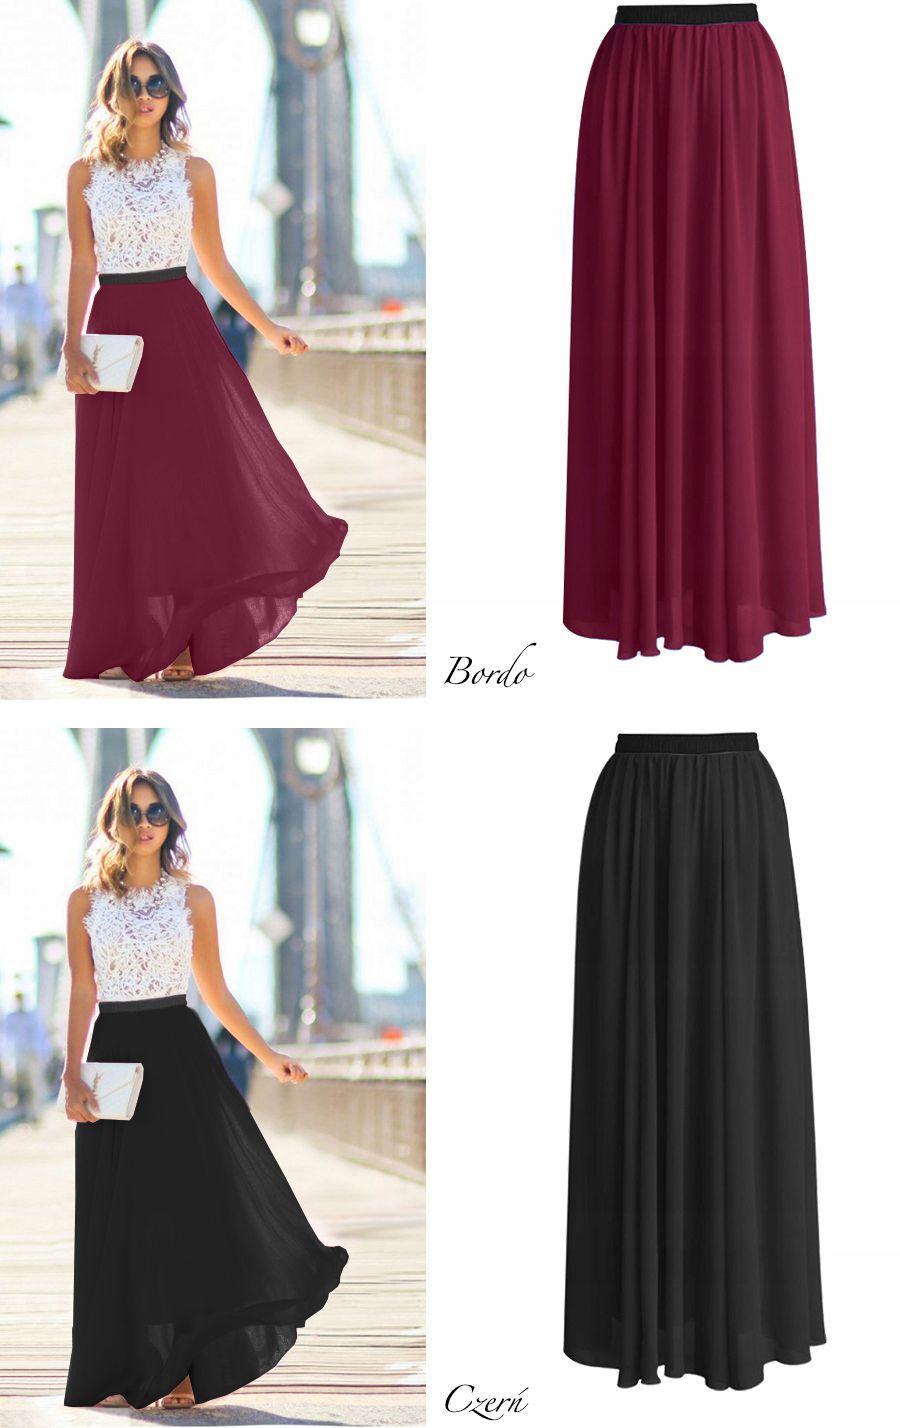 Szyfonowa Spodnica Maxi Dluga Guma 8003491976 Allegro Pl Fashion High Low Dress Dresses